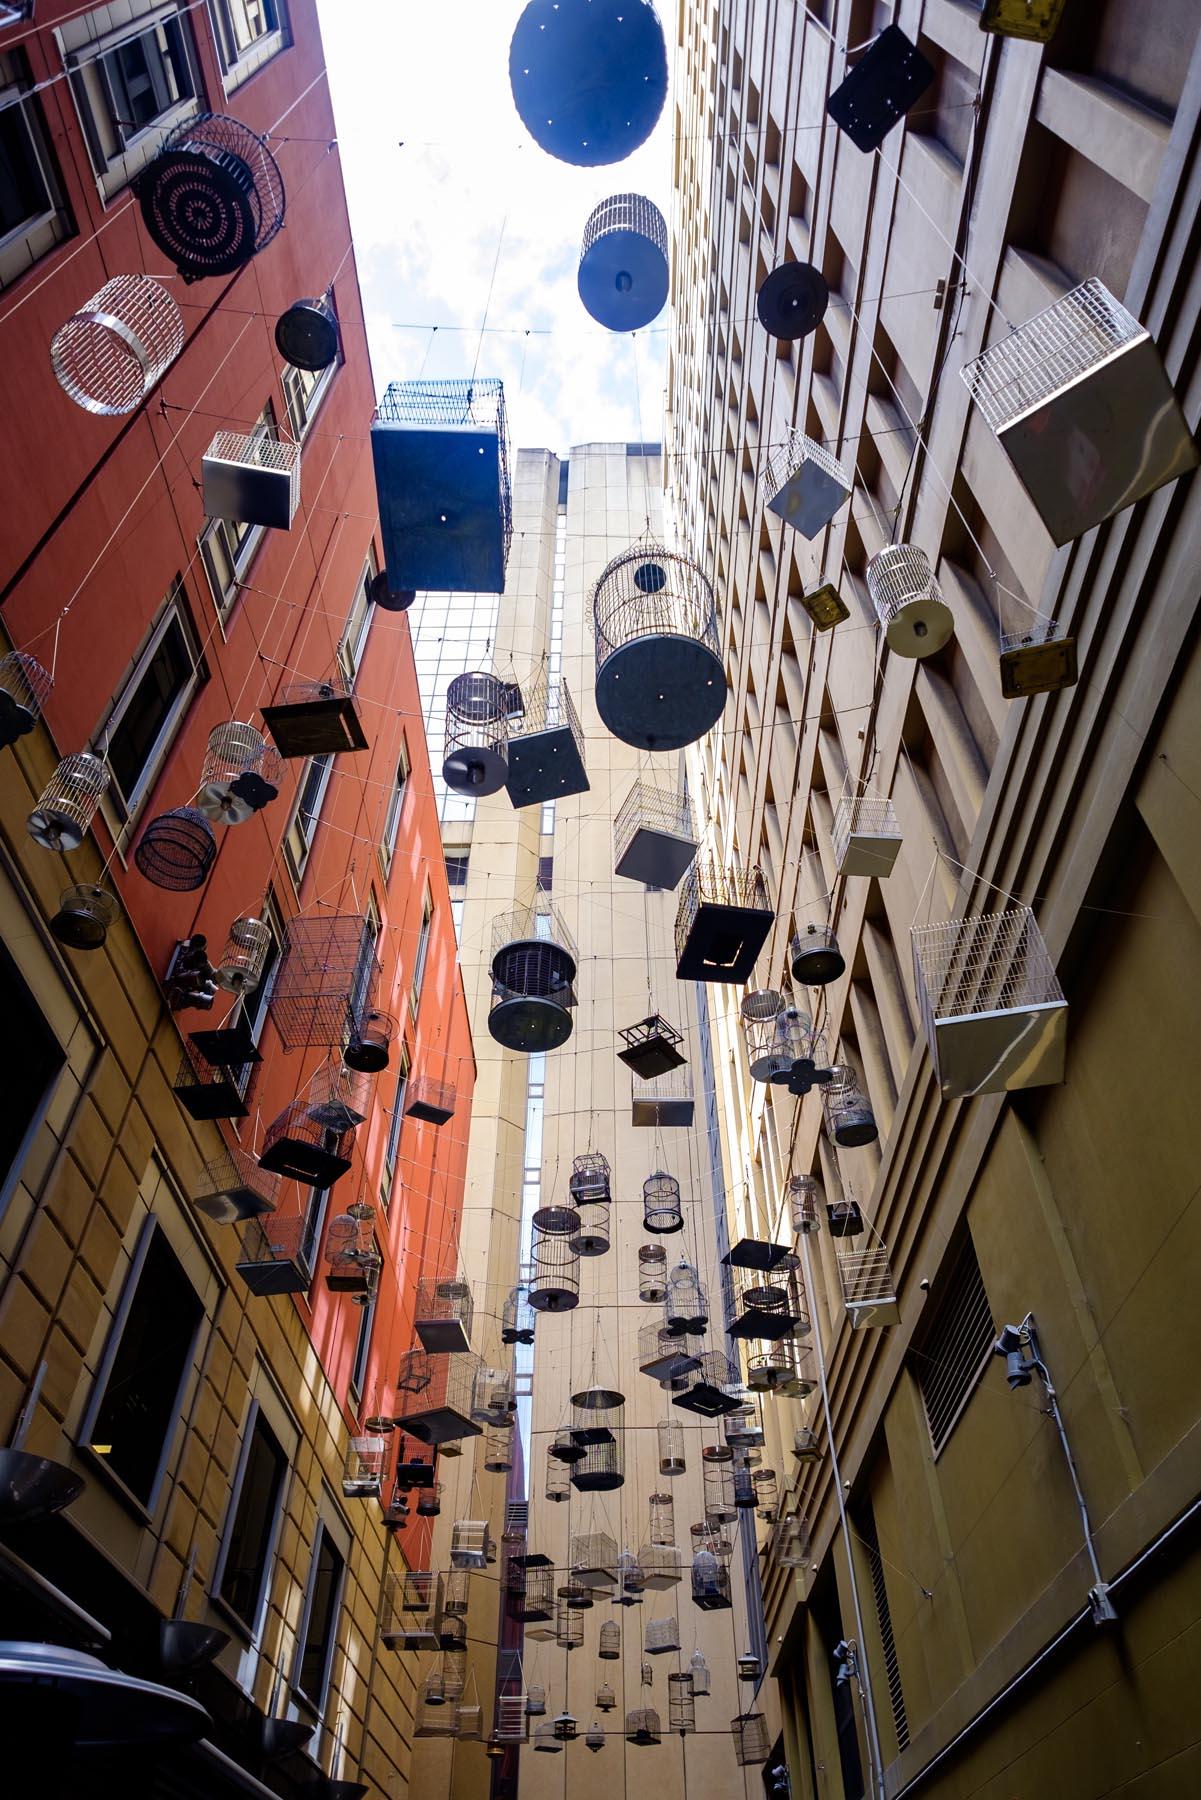 hanging bird cages Sydney Australia